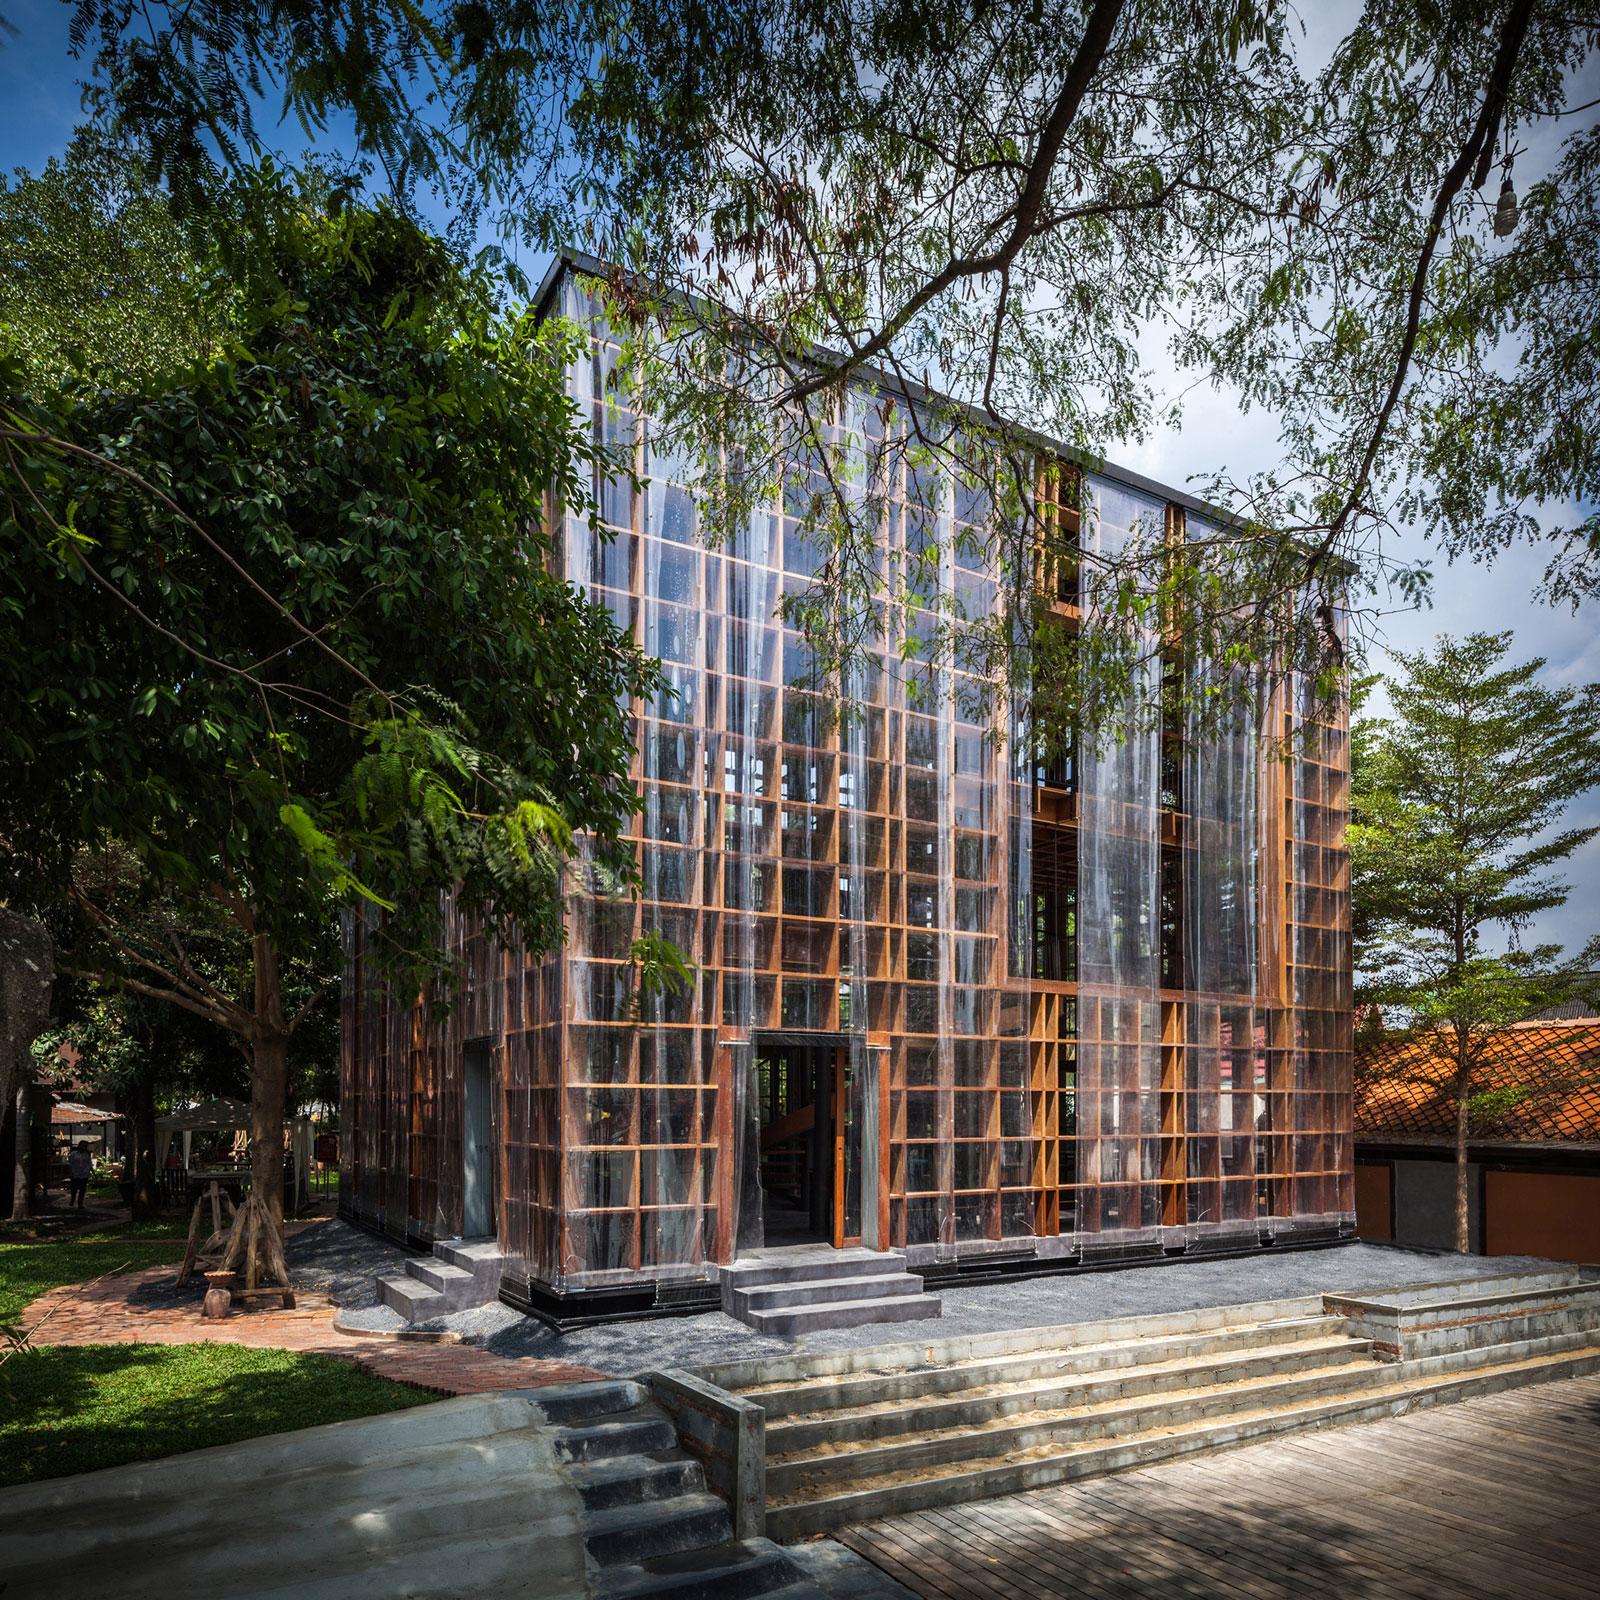 wine-bangkok-project-studio-architecture-public-leisure-thailand-_dezeen_sq-a